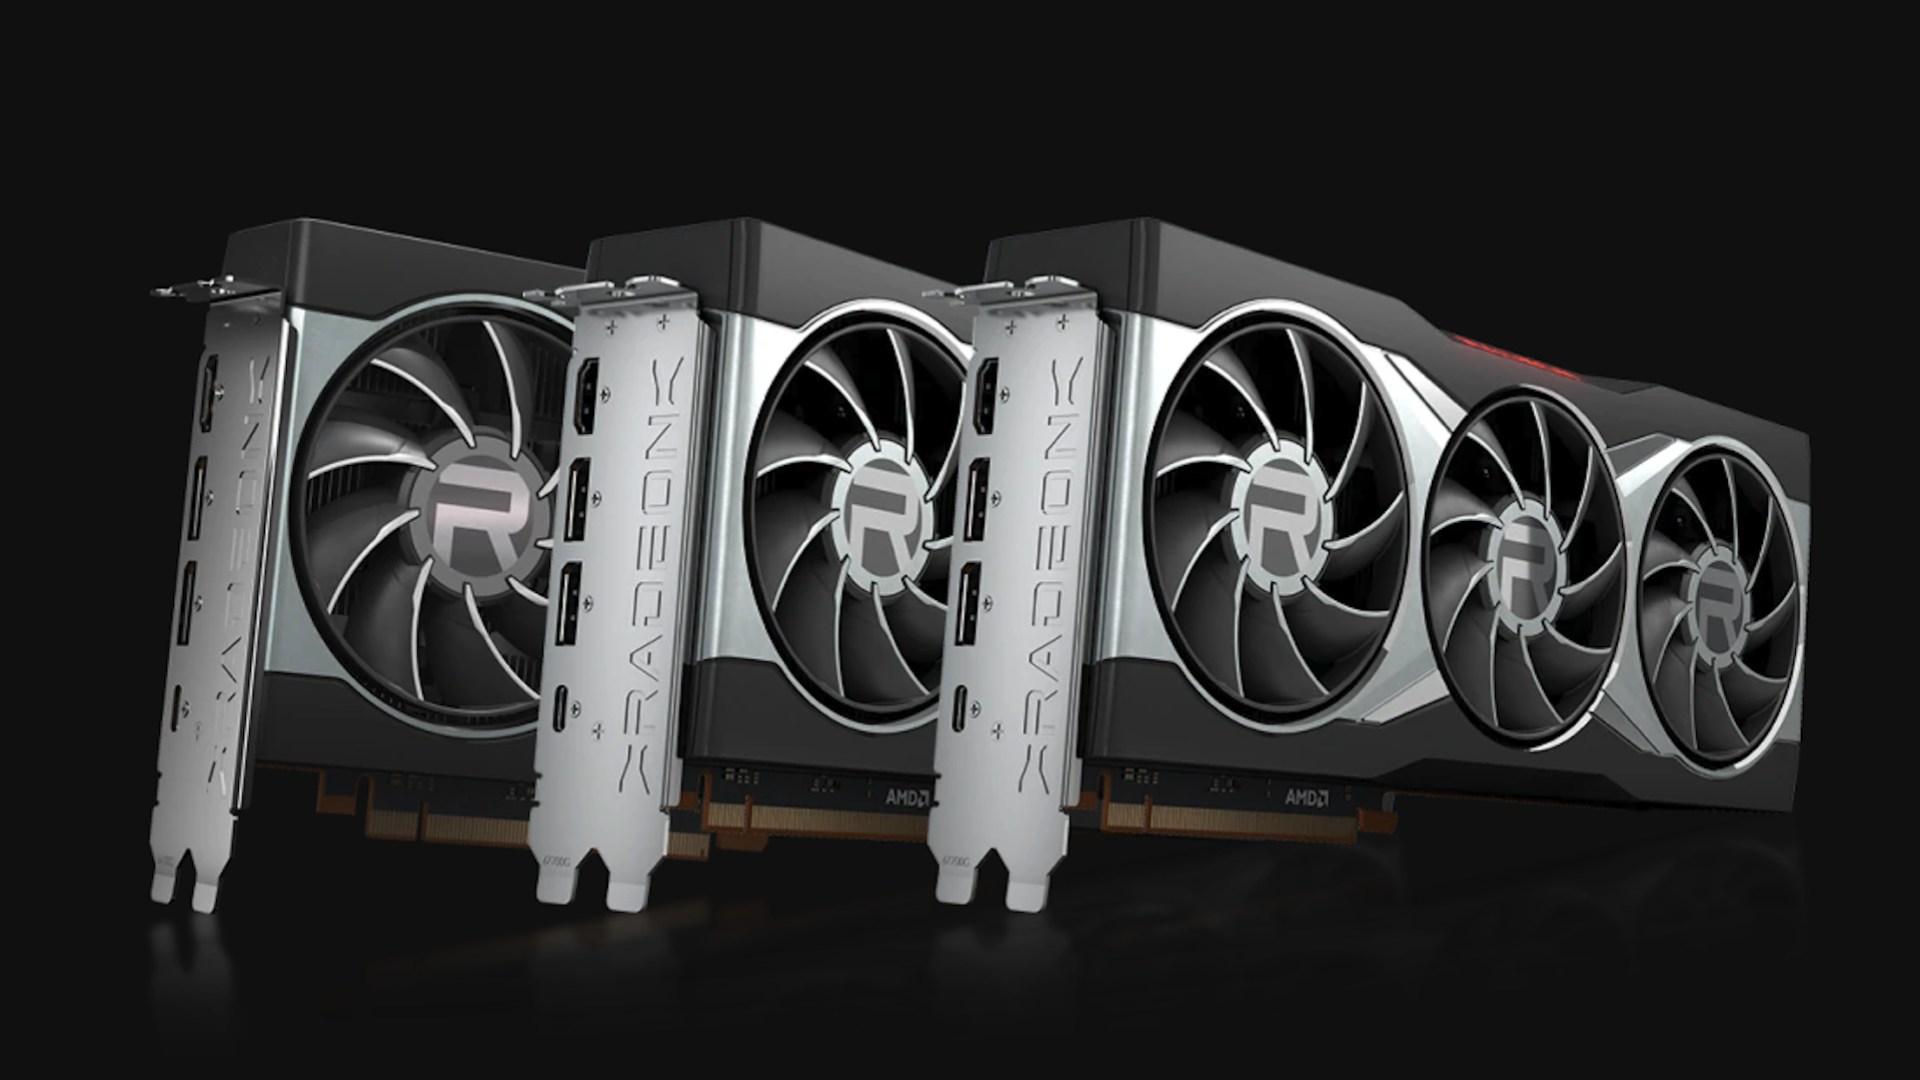 Amd, AMD Radeon, AMD Radeon RX 6800, RX 6800